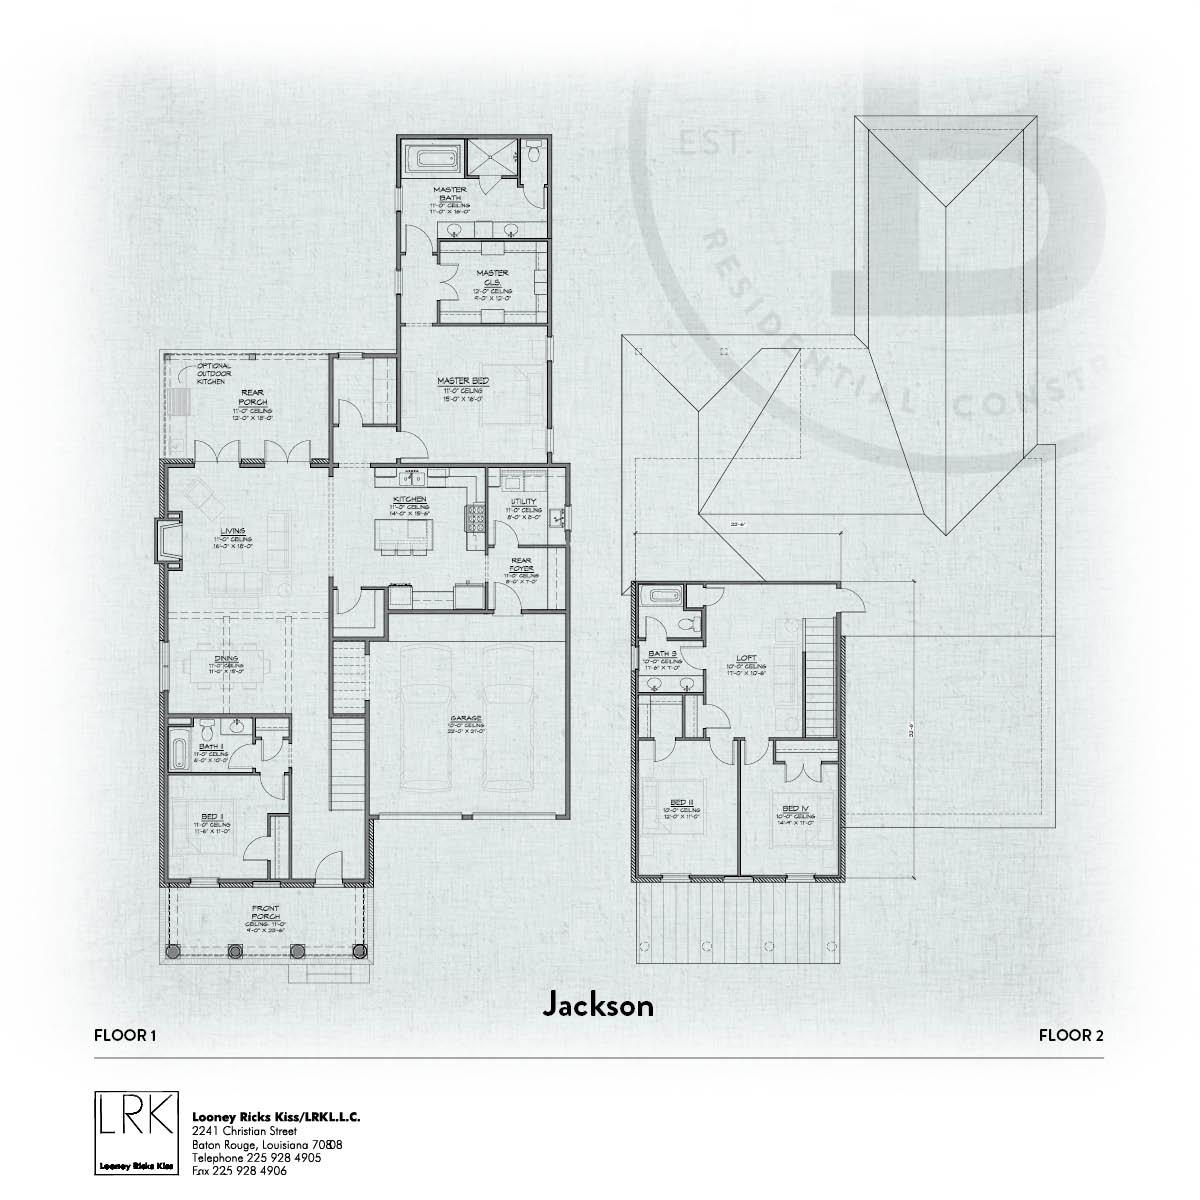 Jackson A Floorplan